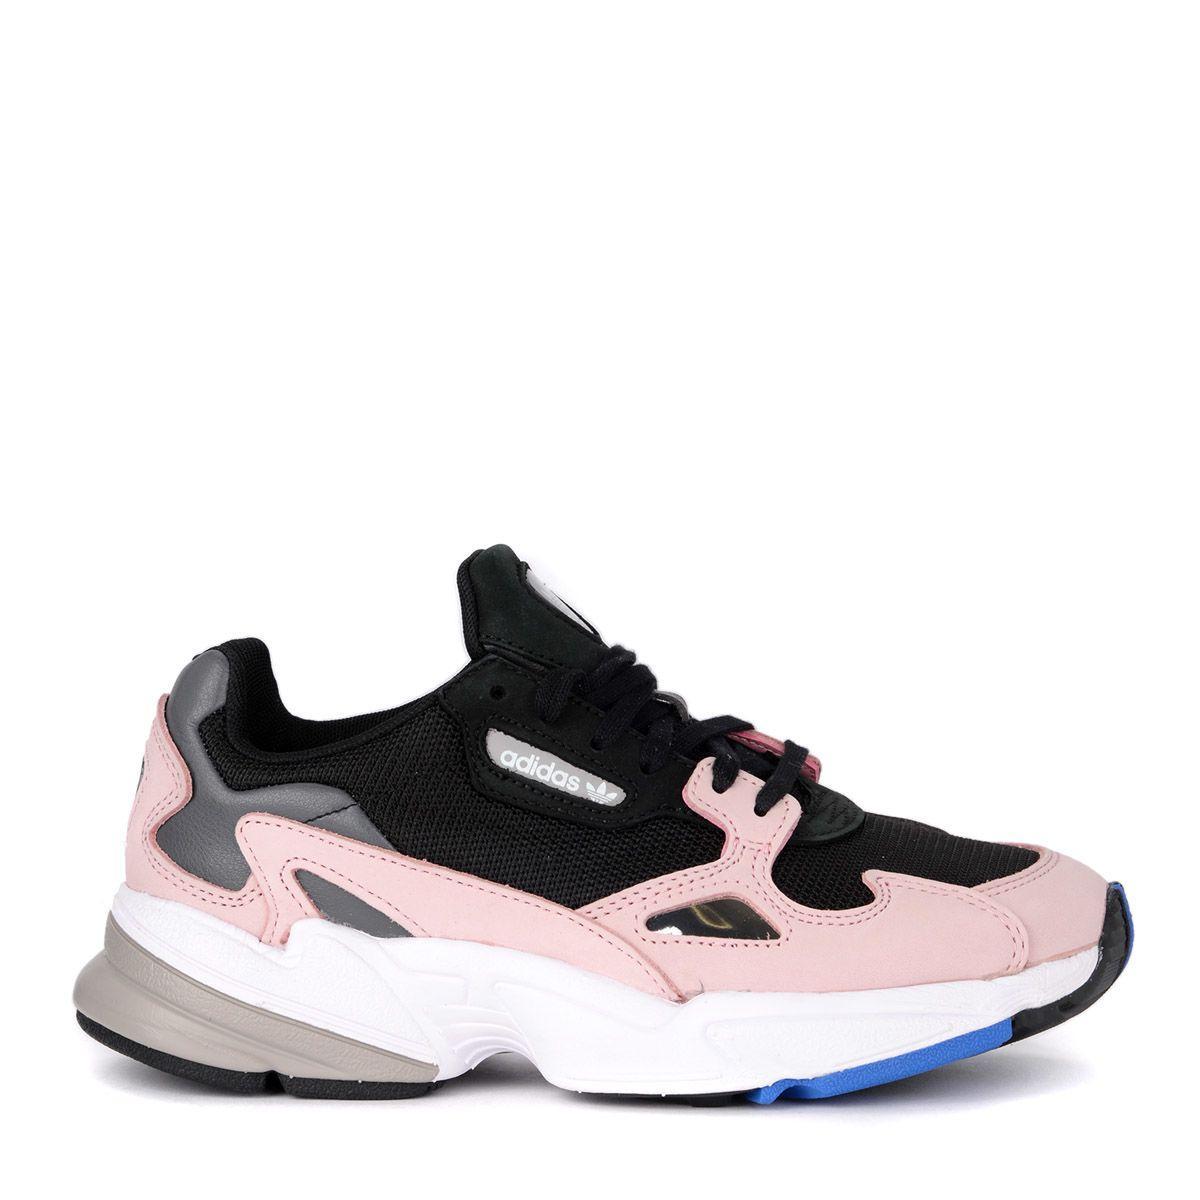 new concept detailed look lowest price Sneaker Adidas Originals Falcon In Mesh Nero E Suede Rosa